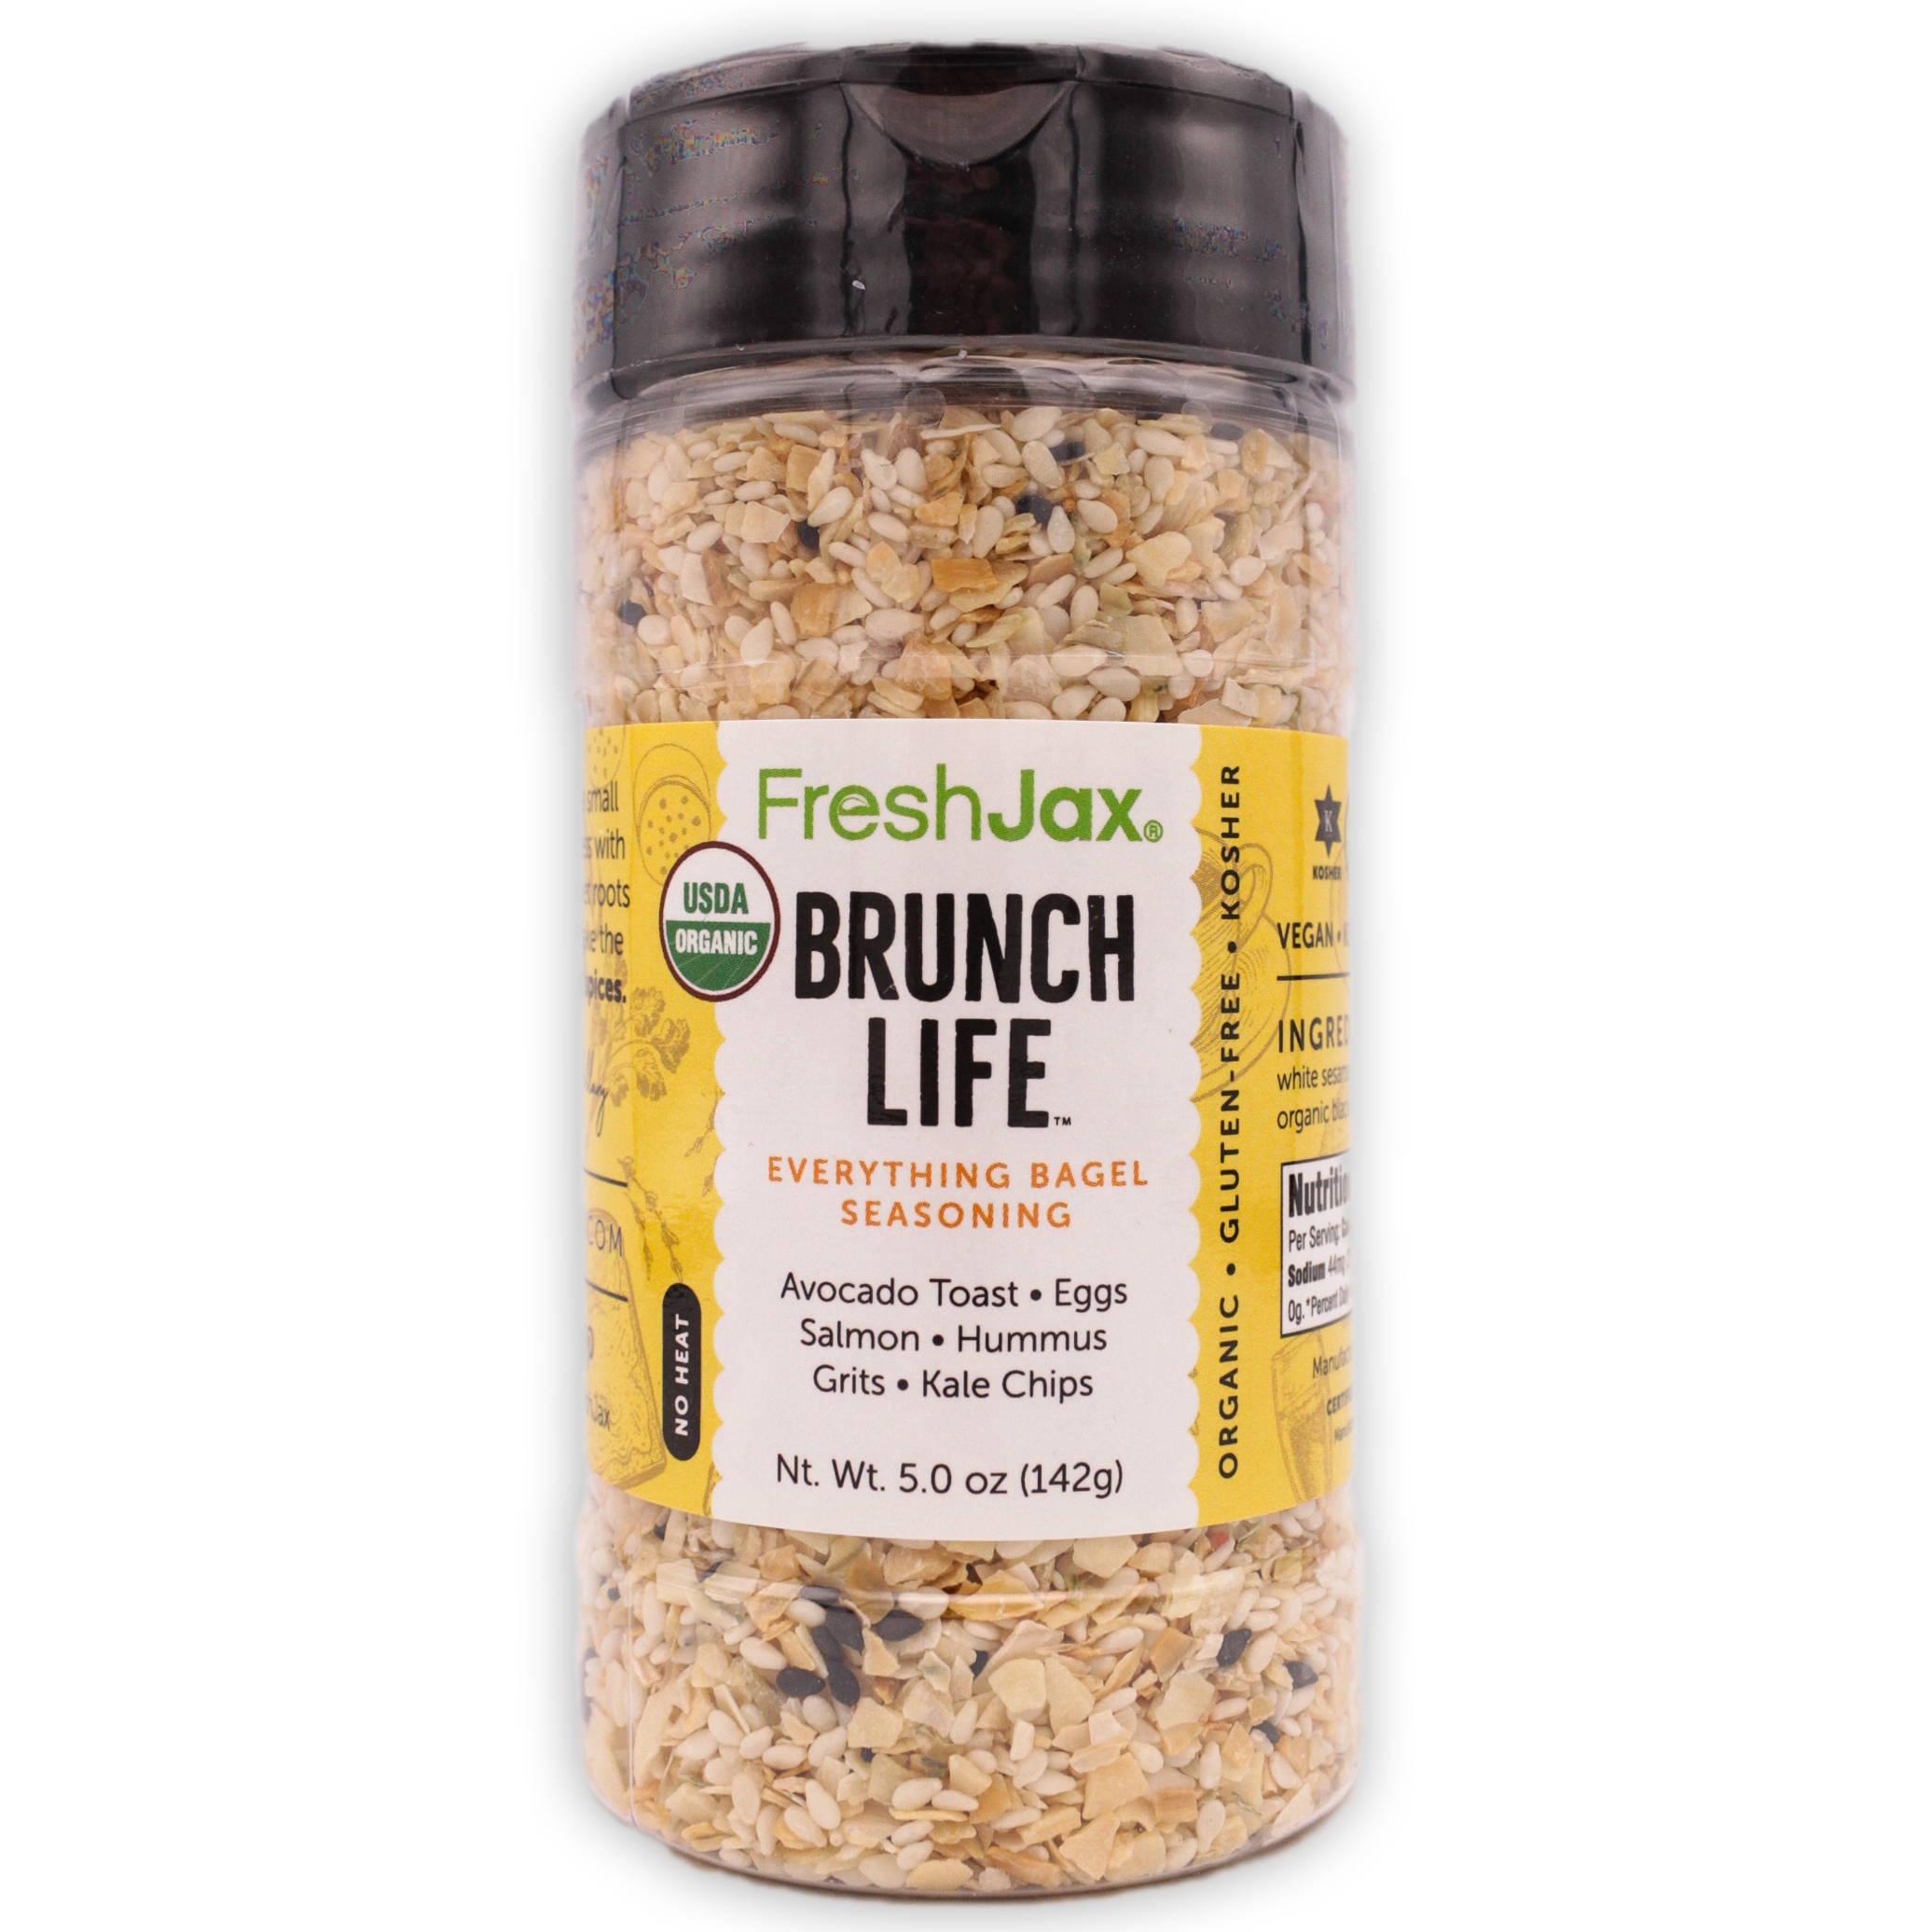 FreshJax Organic Spices Brunch Life Everything Bagel Seasoning large bottle